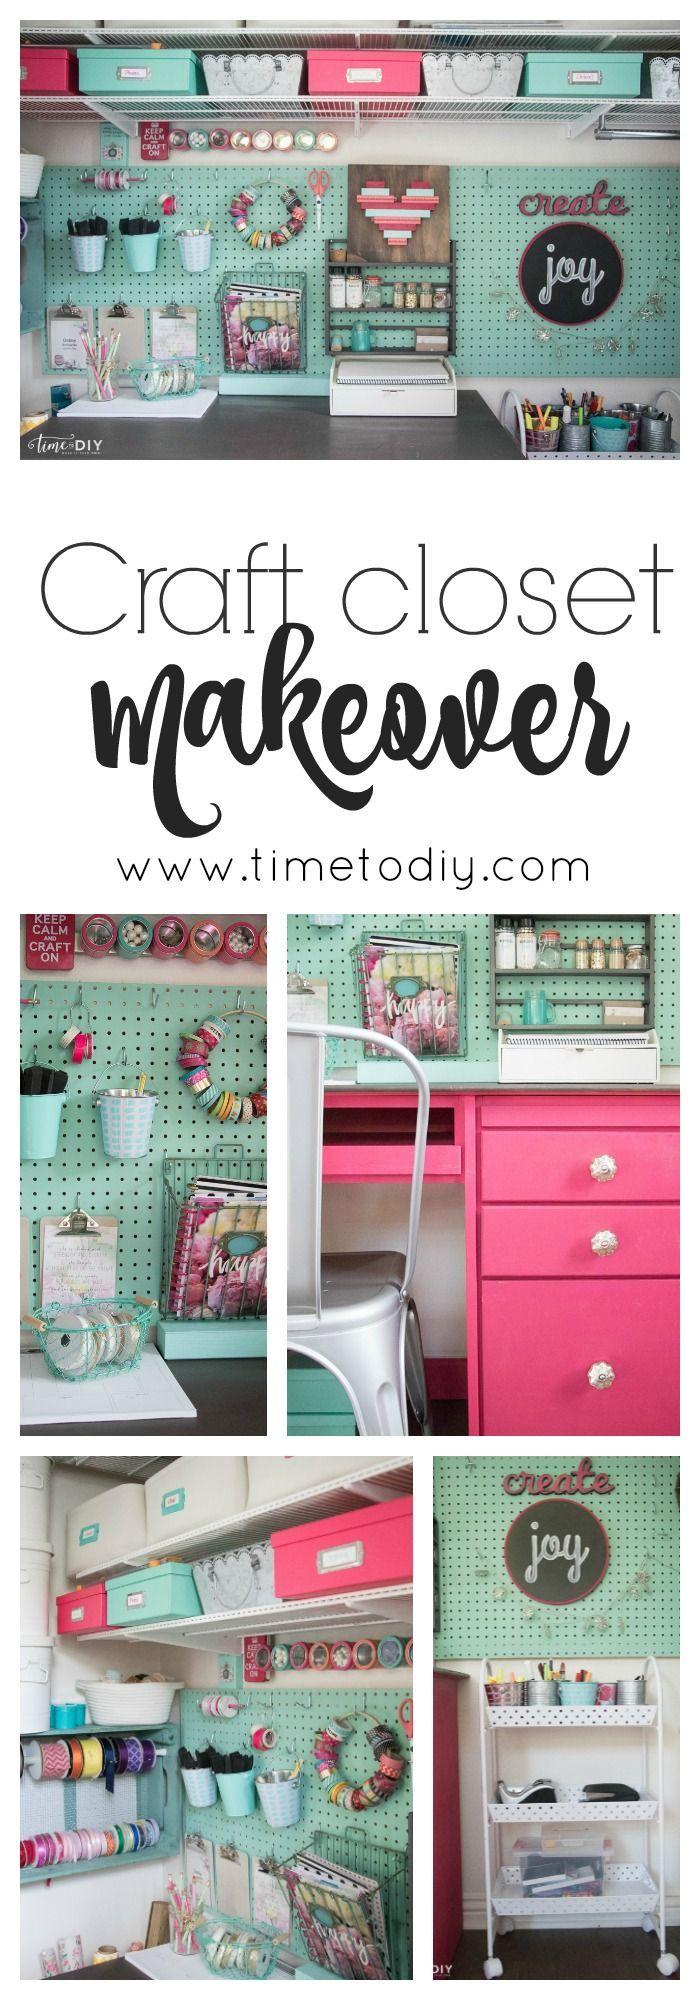 Best 25 closet desk ideas on pinterest closet office desk nook and desk in a closet - Keep your stuff organized with bedroom closet organizers ...